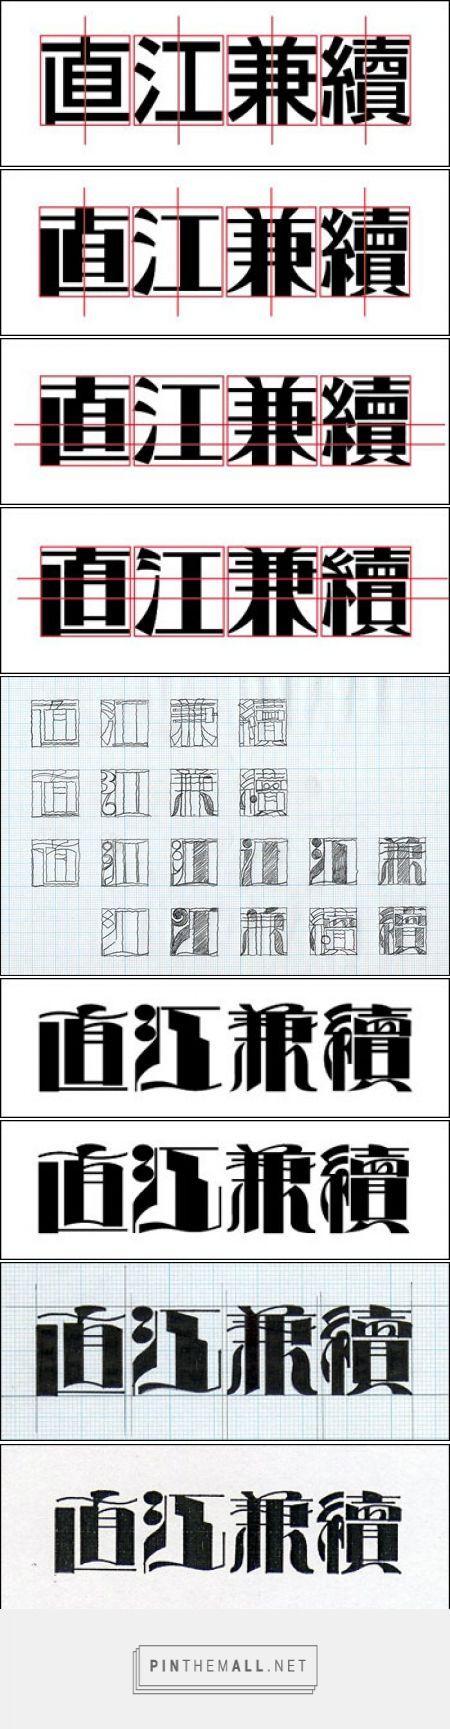 NAKACO'S CRAFT'S WEBLOG: モダン装飾図案文字を書いてみる